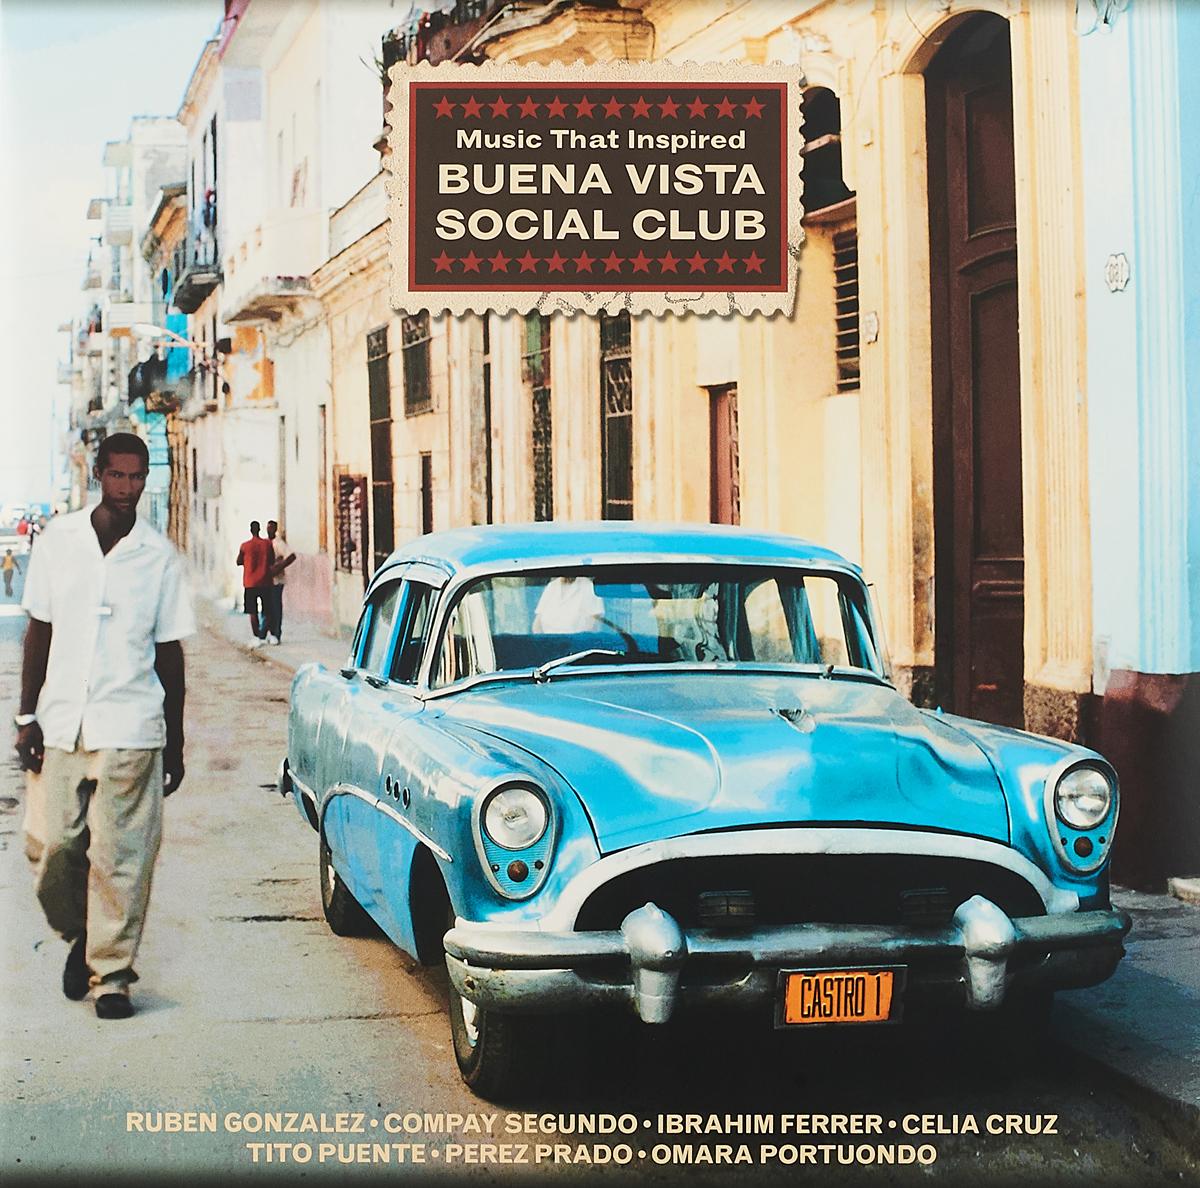 Рубен Гонсалес,Компай Сегундо,Ибраин Феррер Music That Inspired Buena Vista Social Club (2 LP) футболка anti social social club